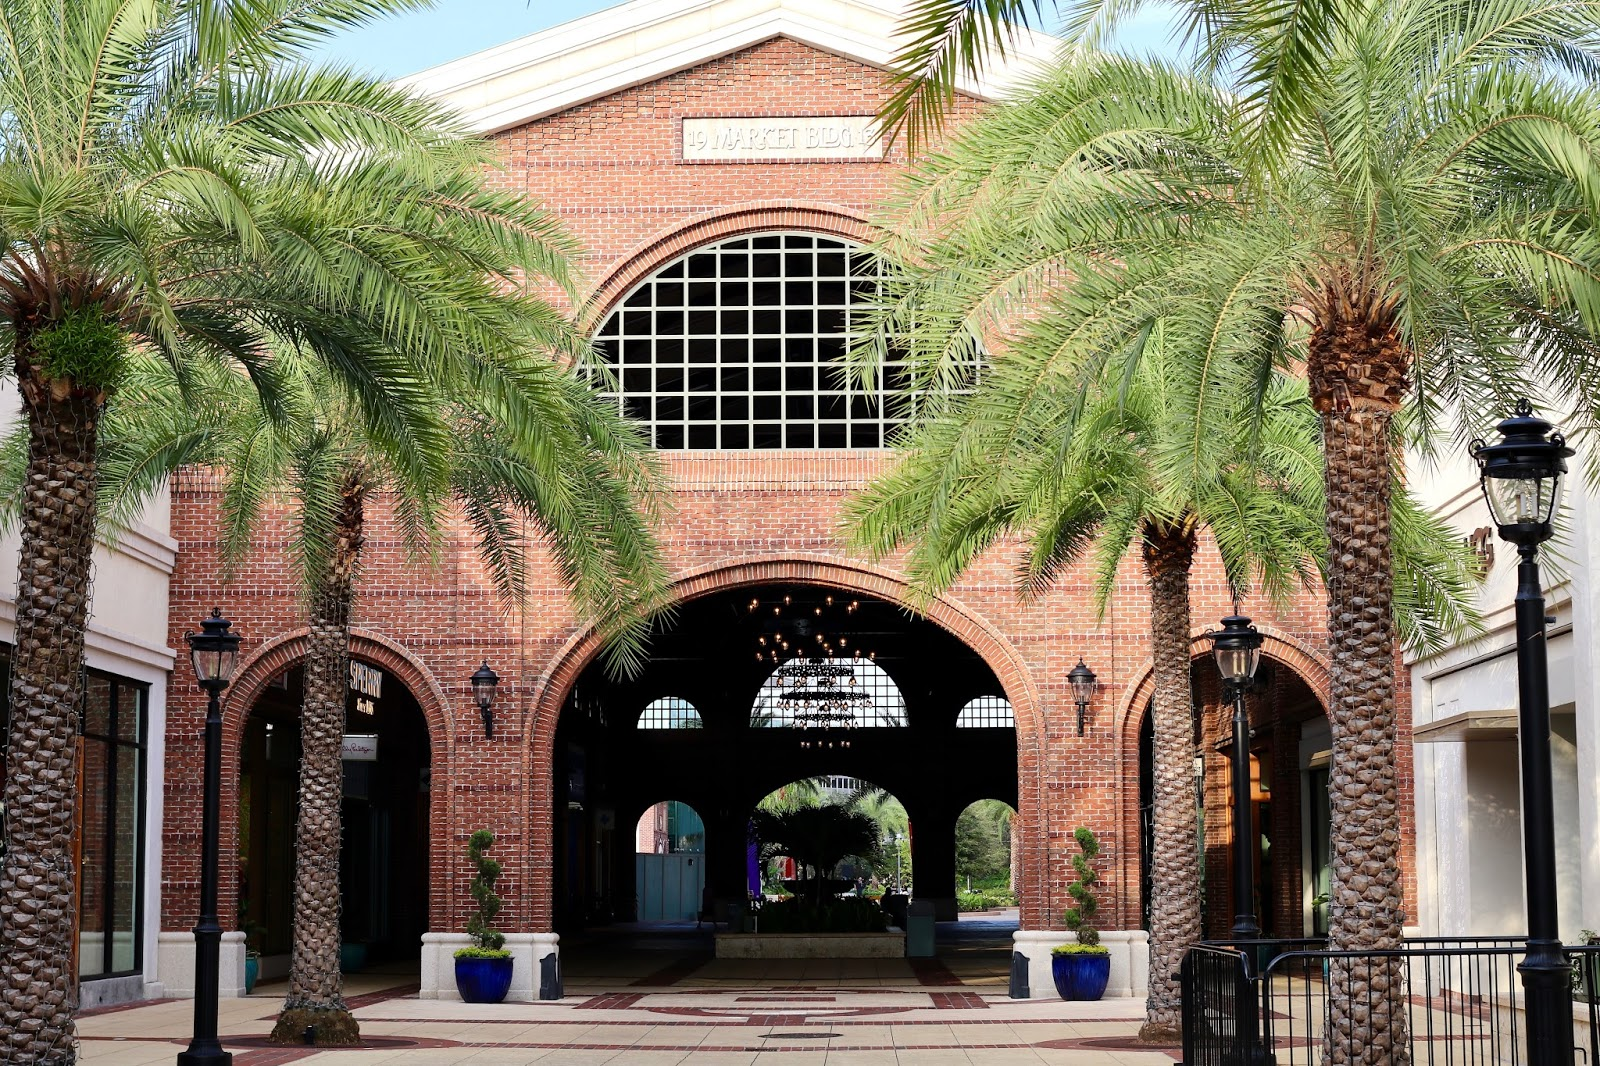 Disney-Springs-mall-Orlando-Florida.